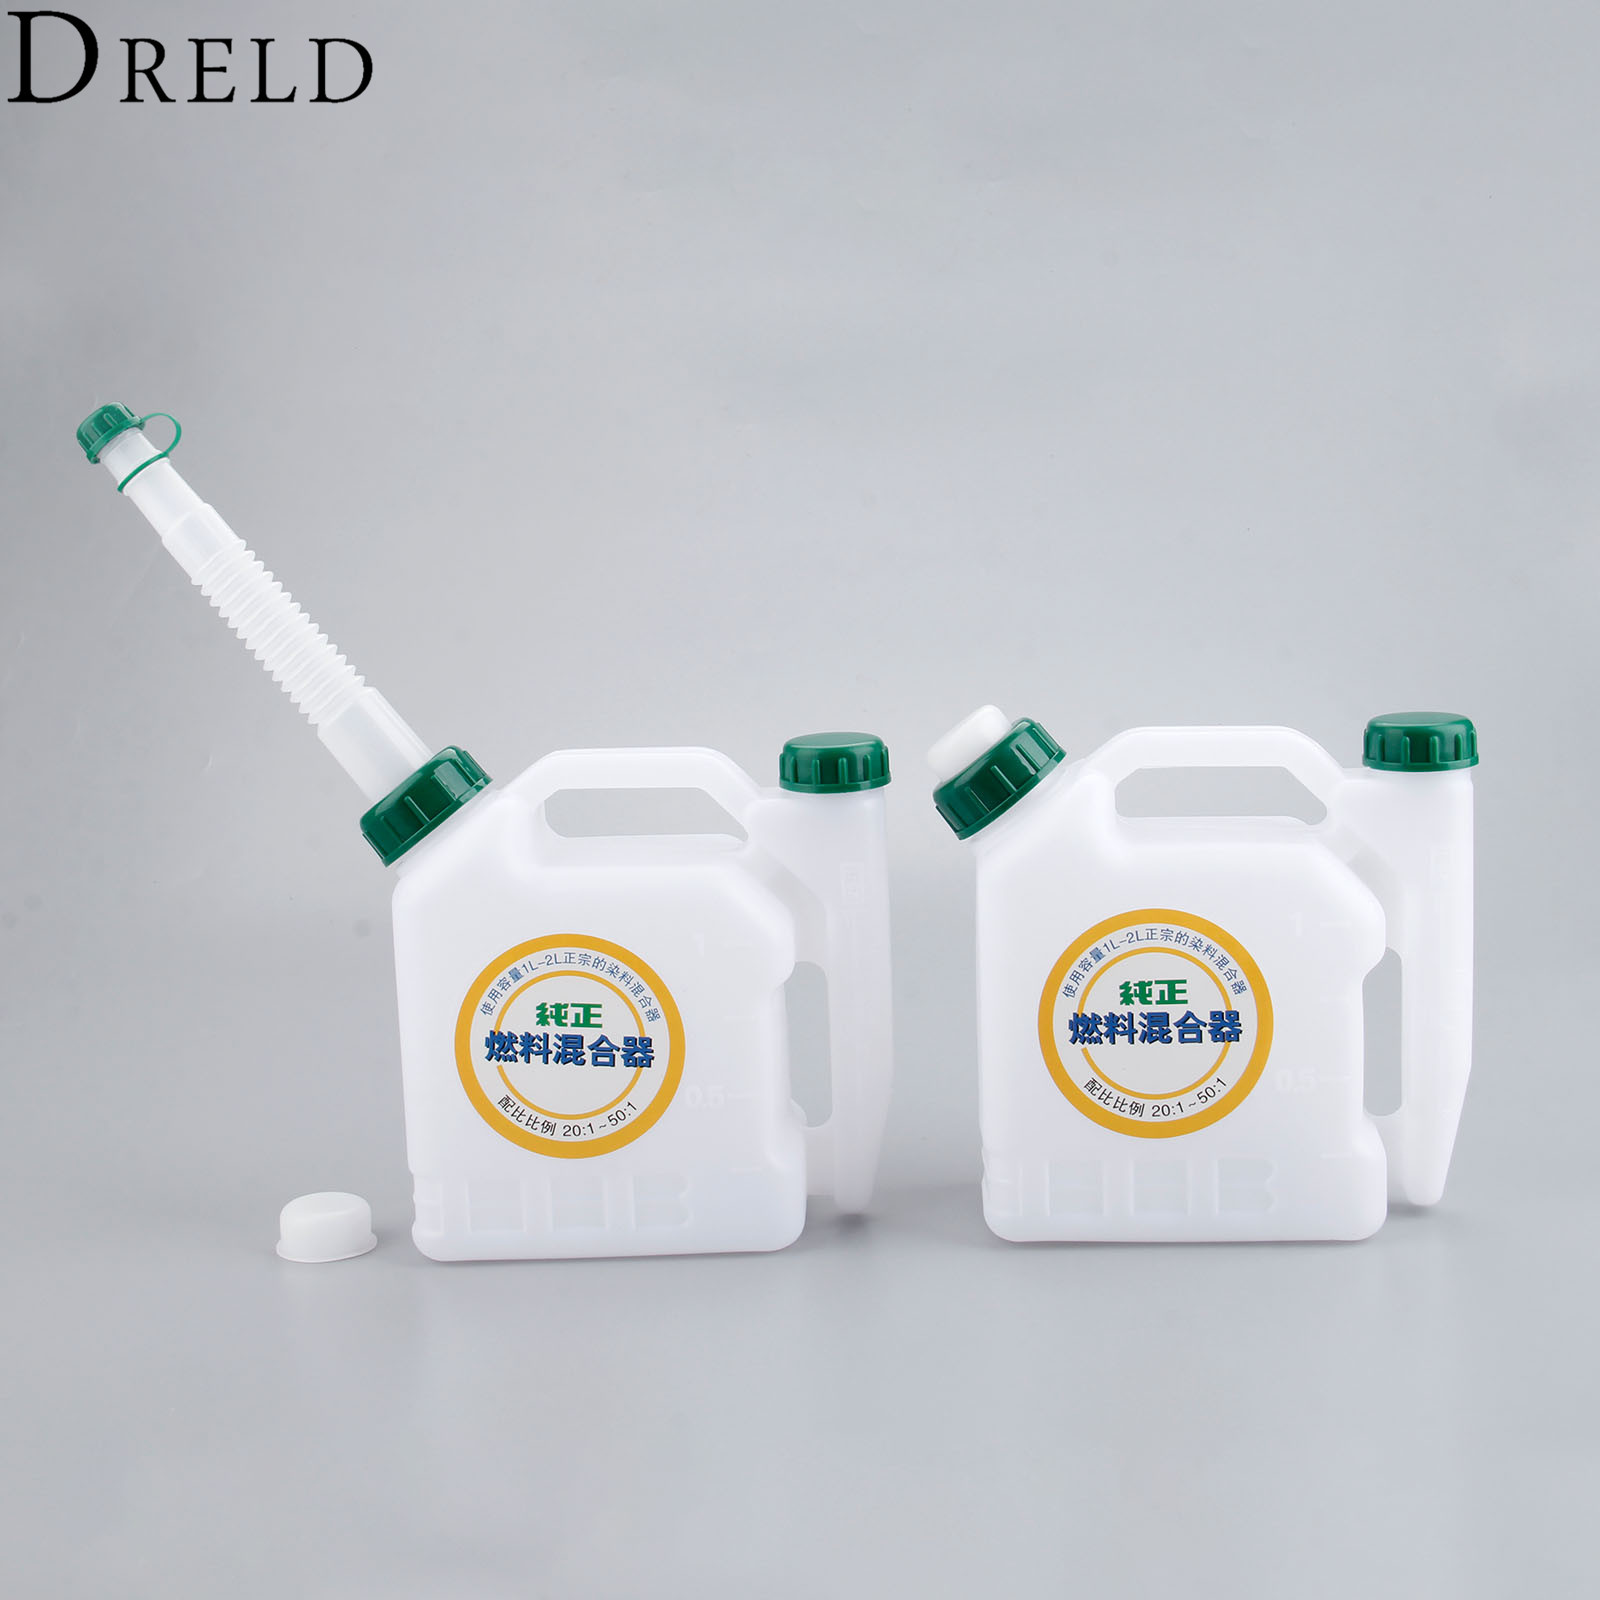 DRELD 1pc Gasoline Chainsaw 1.0L 25:1/50:1/40:1/20:1 Ratio Fuel Mixing Bottle Garden Power Tools